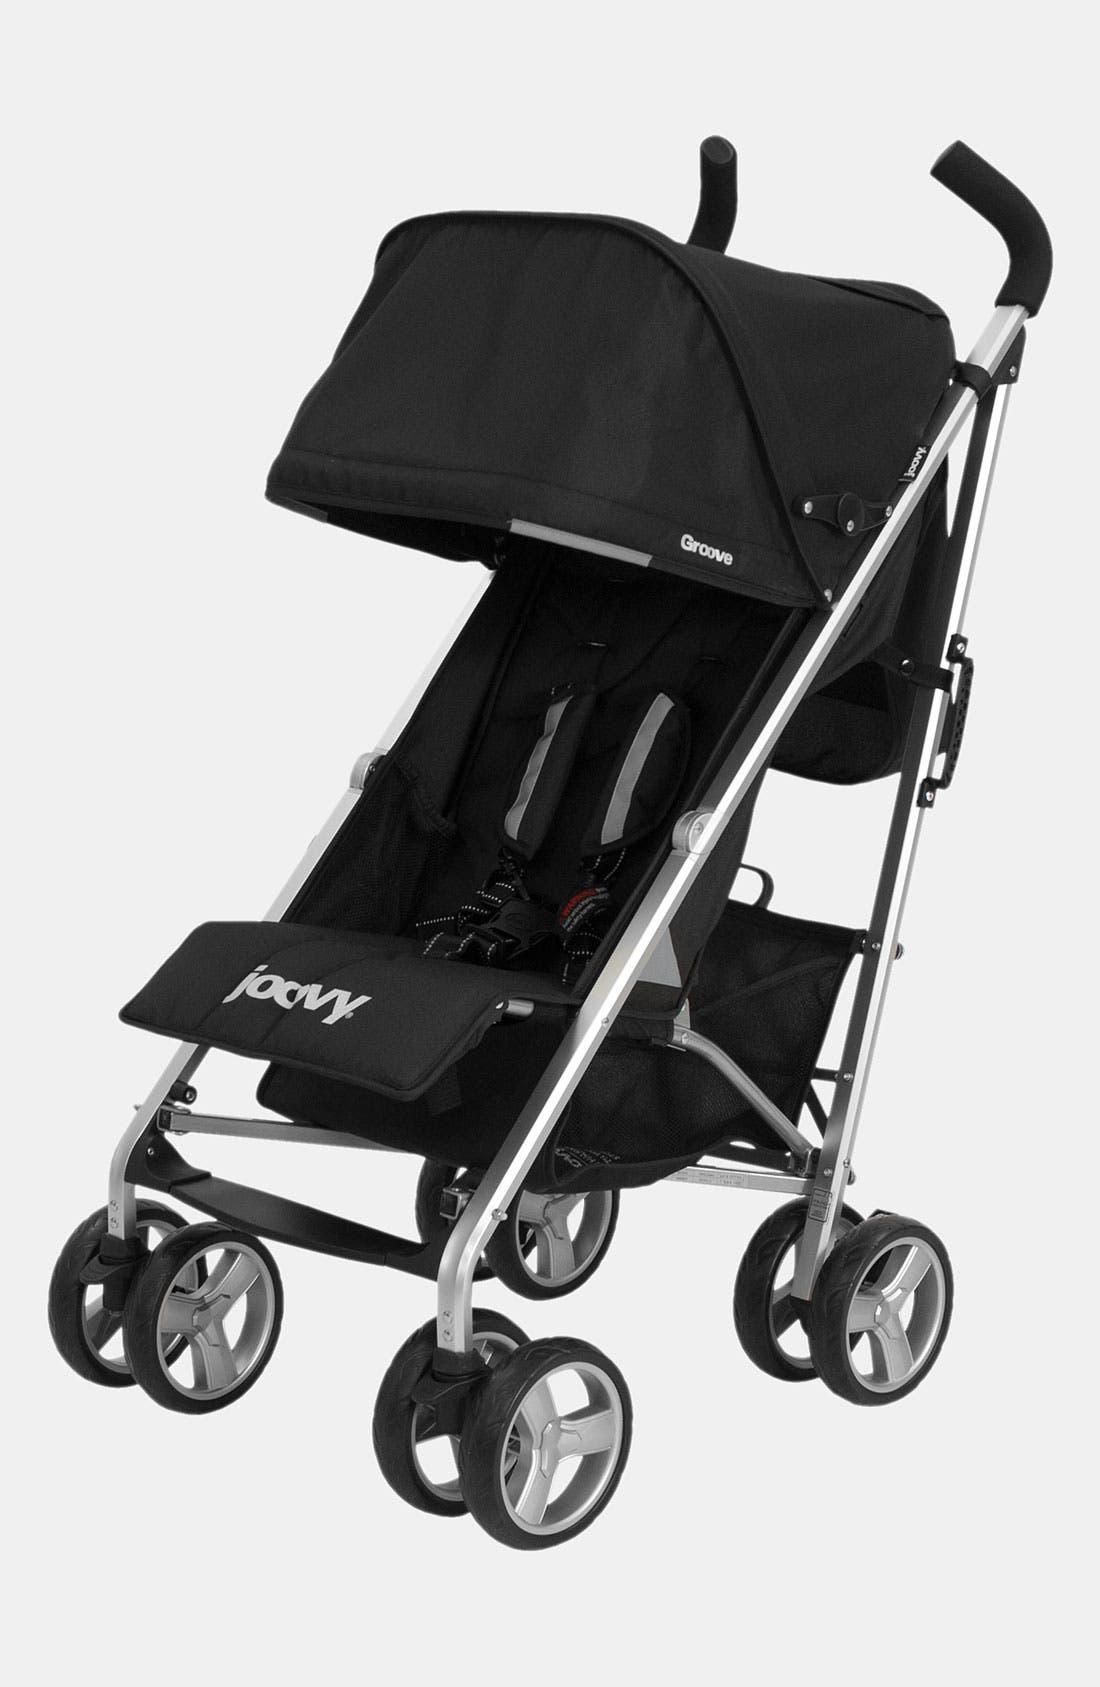 Alternate Image 1 Selected - Joovy 'Groove' Umbrella Stroller